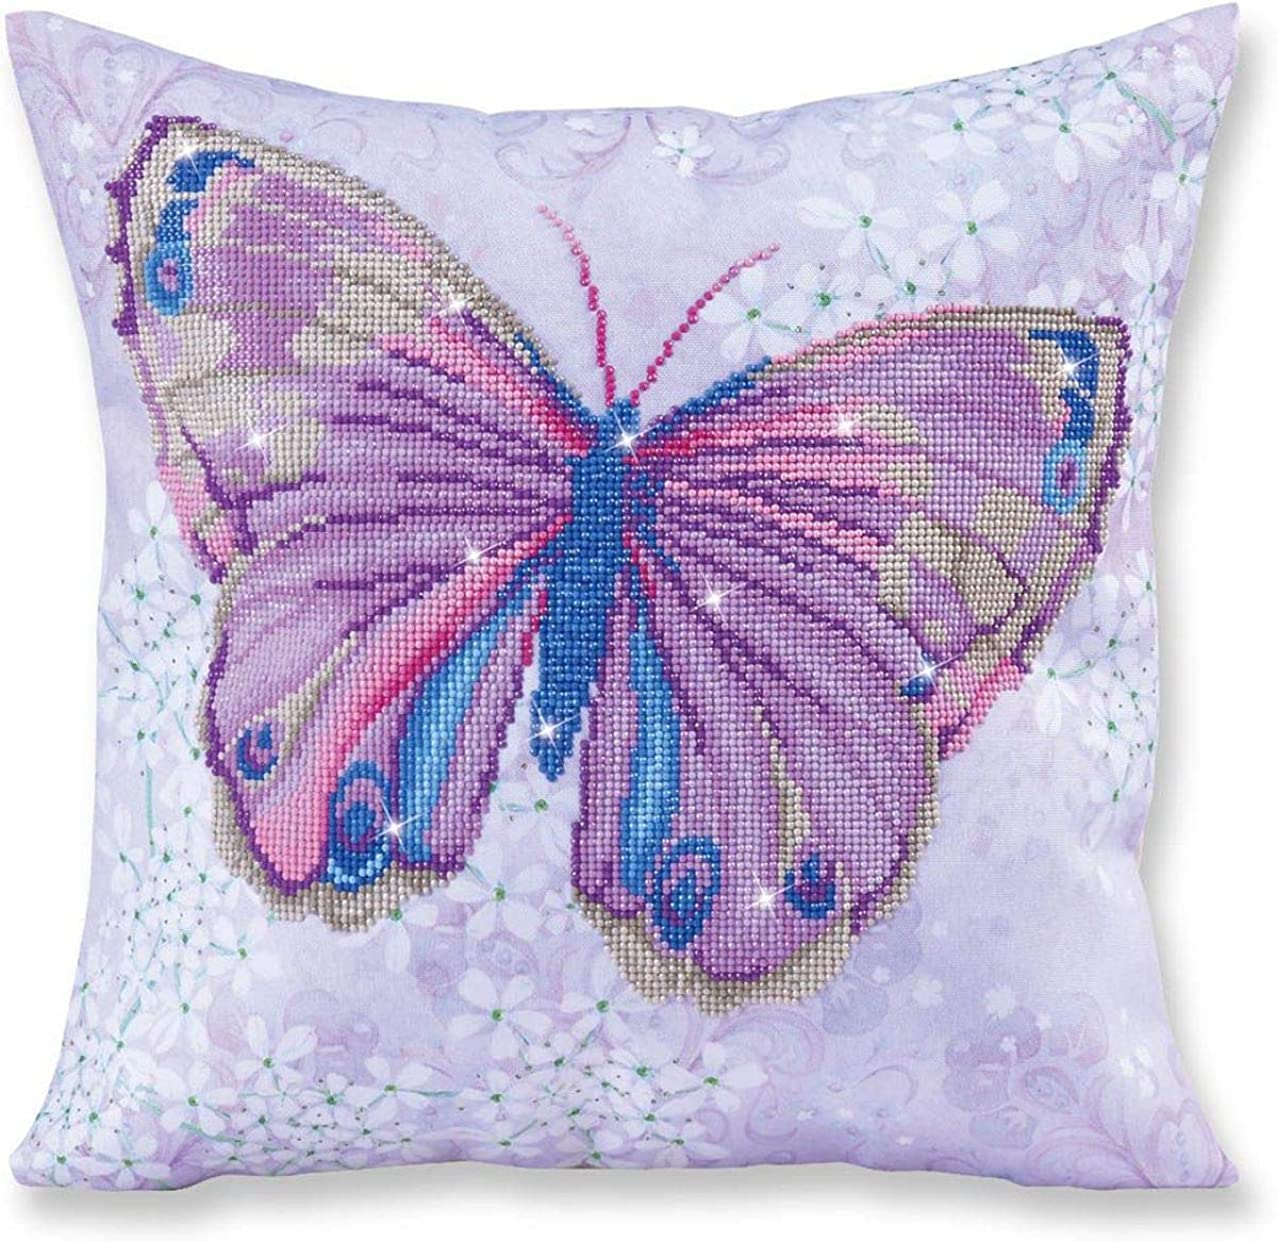 Diamond Dotz Purple Butterfly Pillow 5D Diamond Painting Facet Art Kit